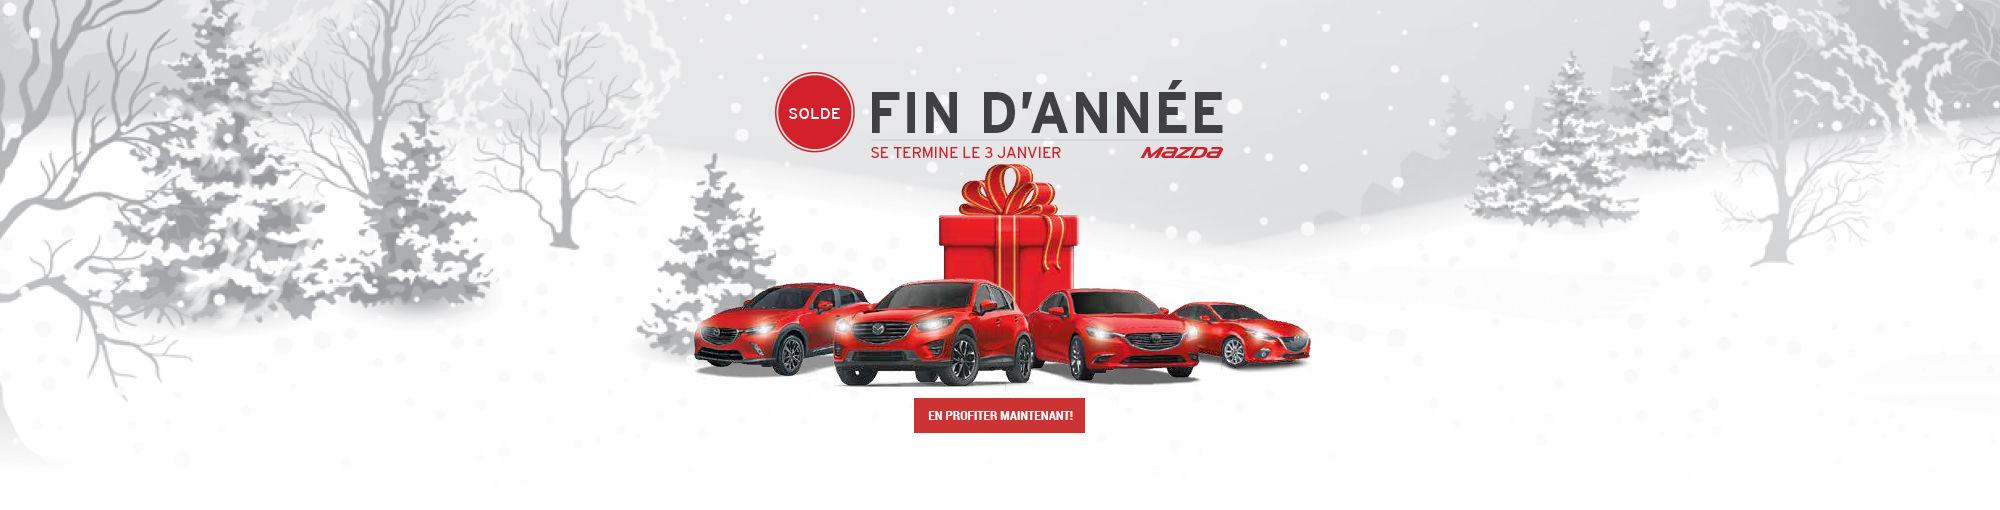 Solde fin année Mazda décembre